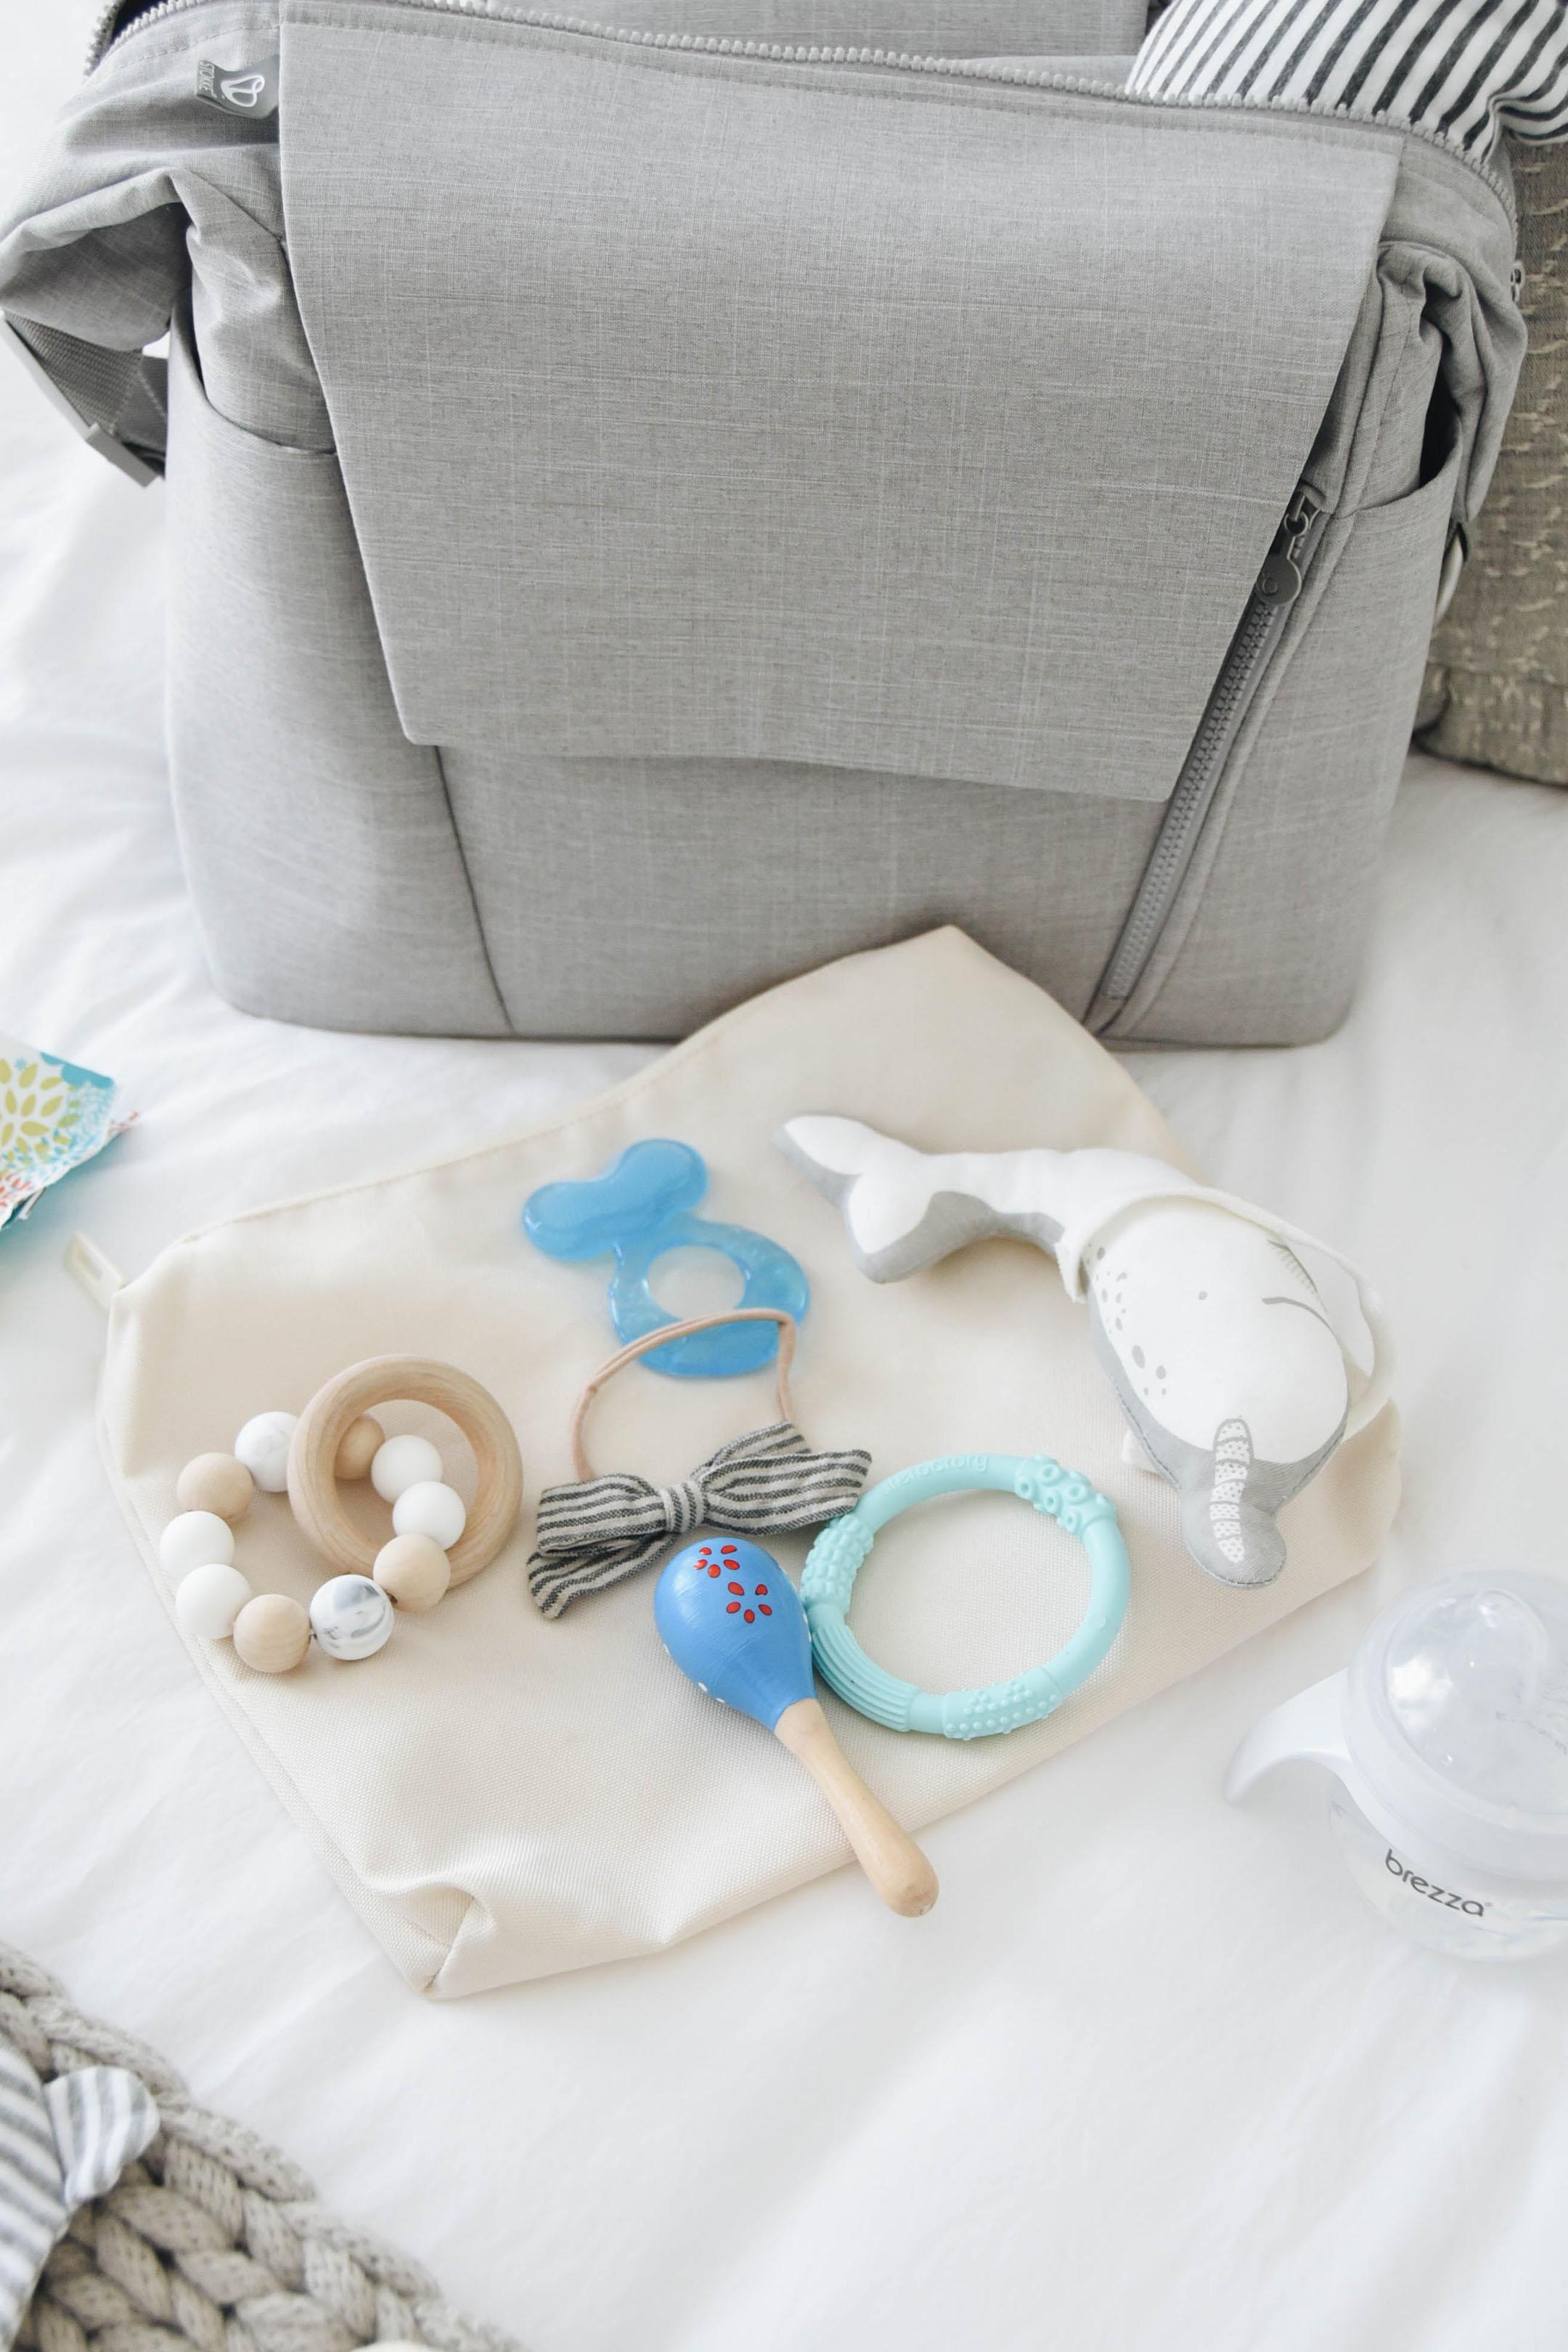 toys for diaper bag